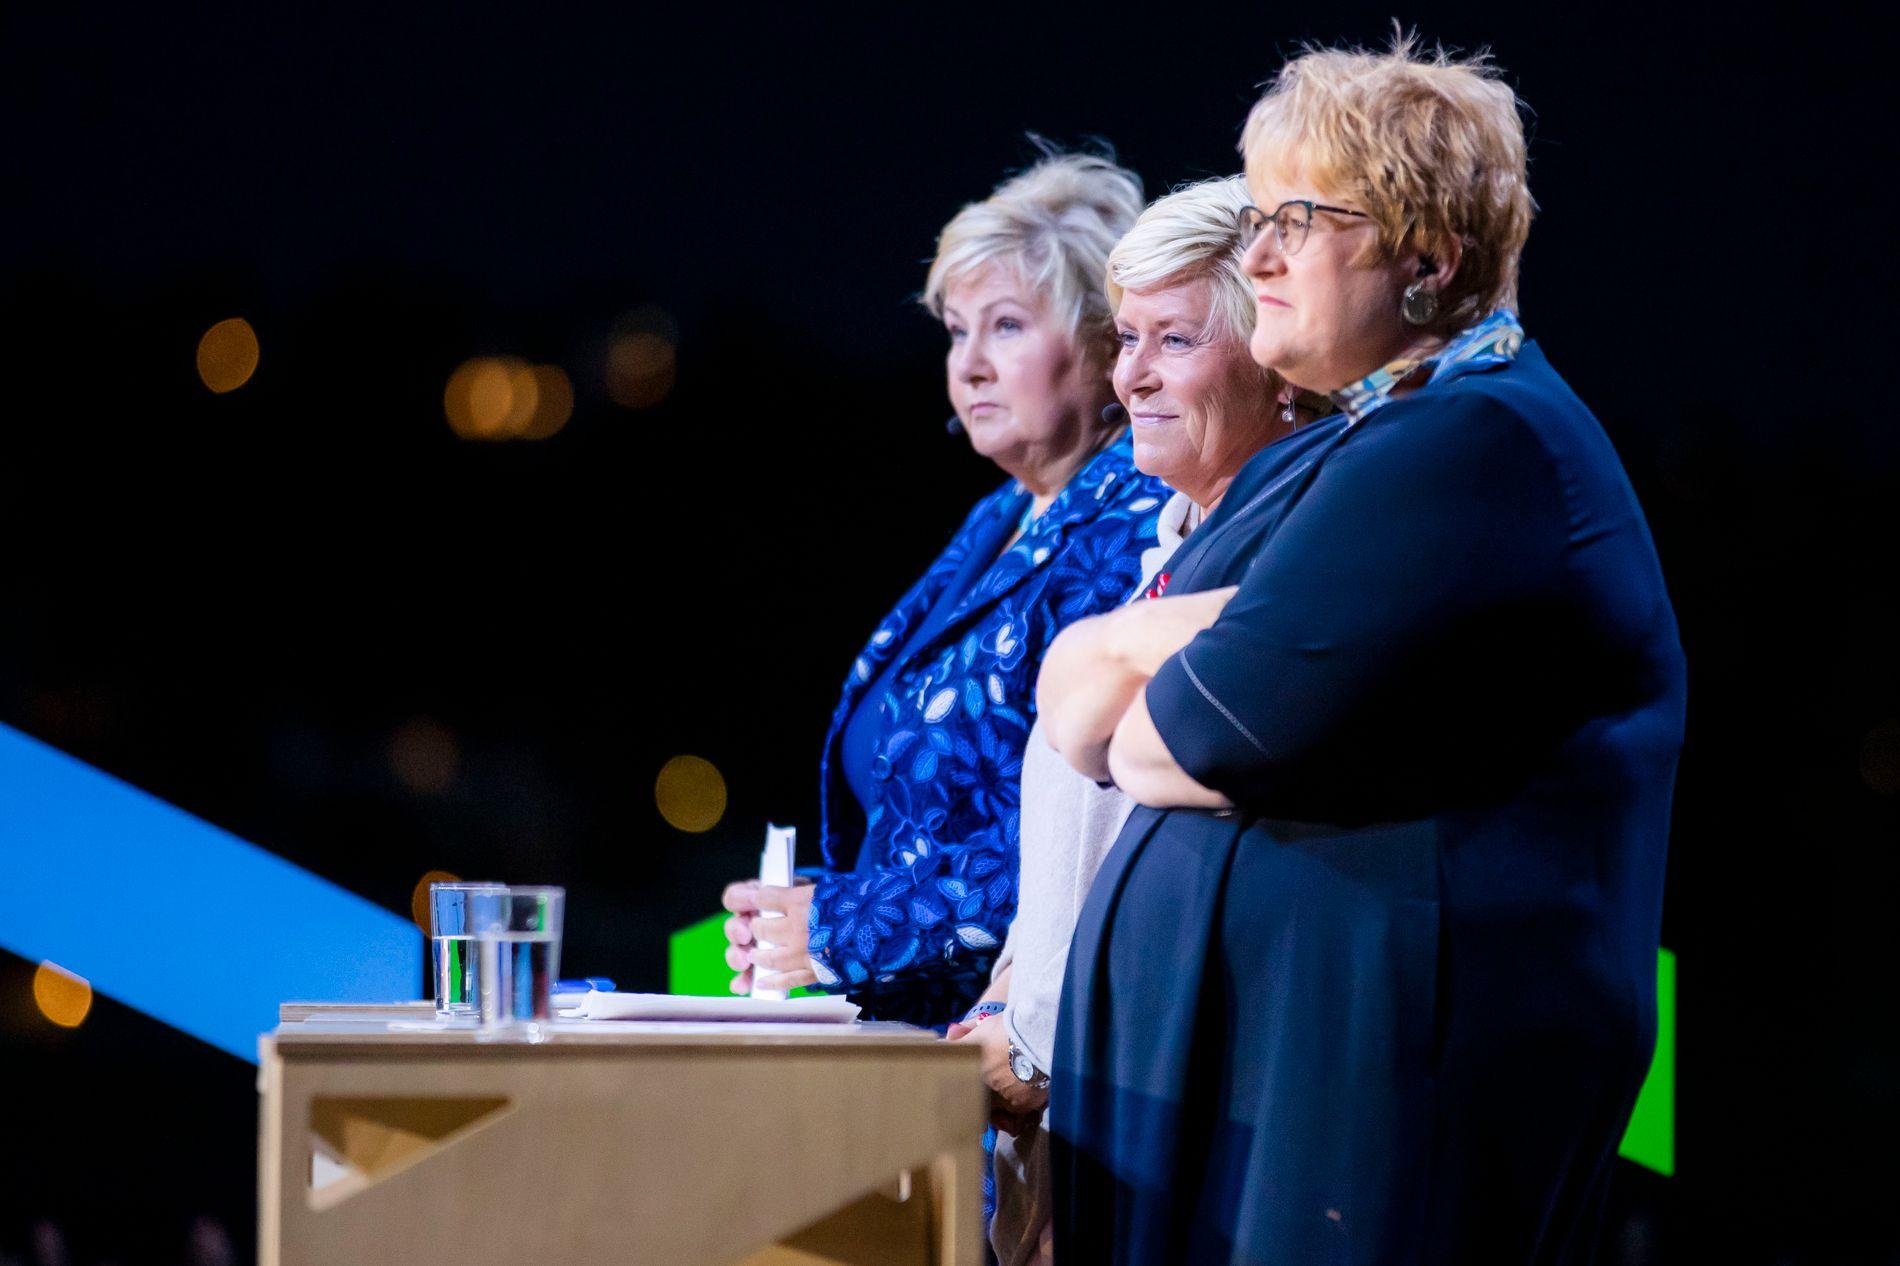 DEBATT: Trine Skei Grande (V) under debatten i Arendal mandag.